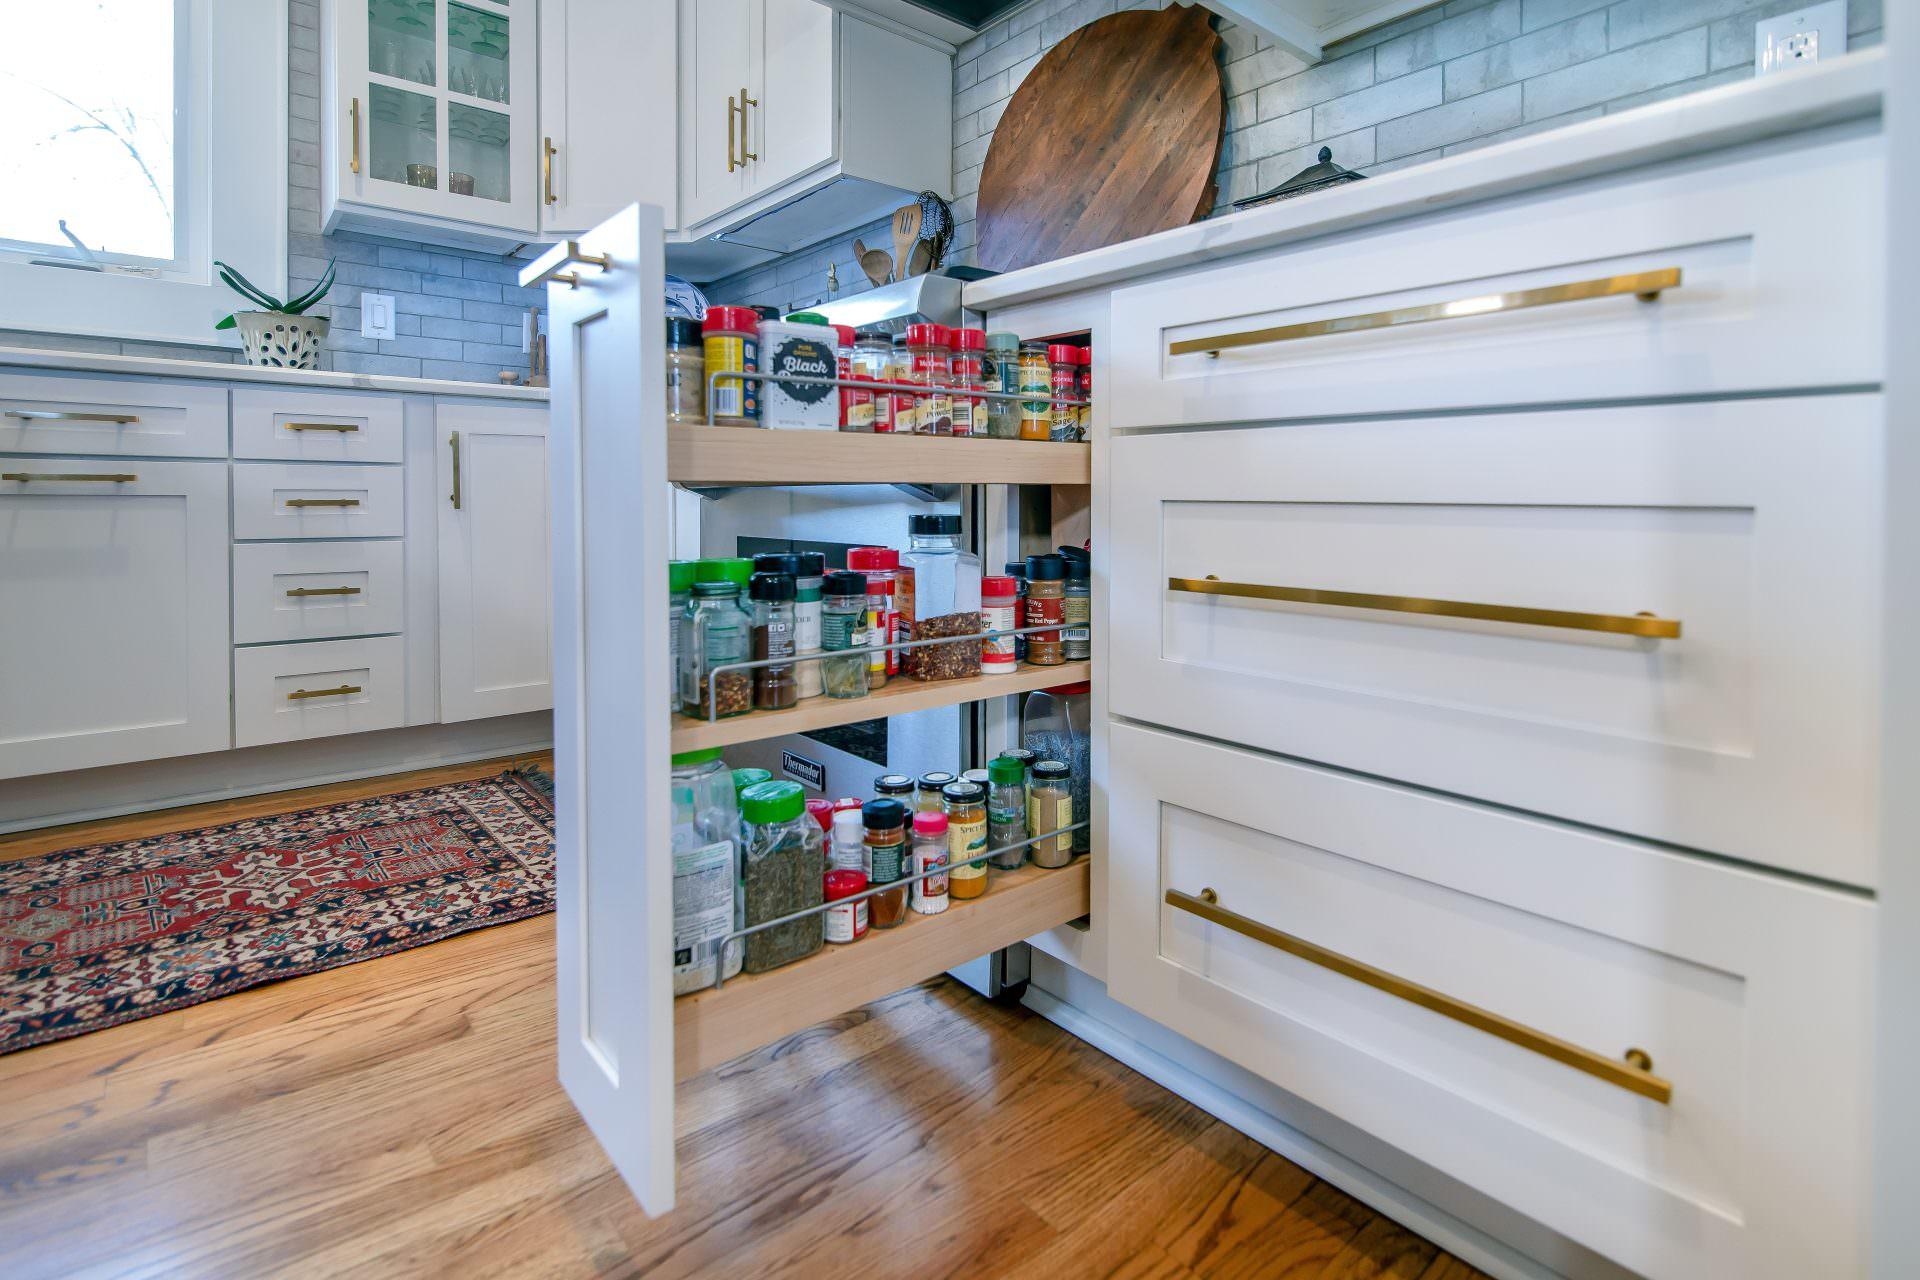 Wellborn Cabinet Spice Pull Out Cabinet Wood Floor Kitchen Backsplash Greenbrook Design Center